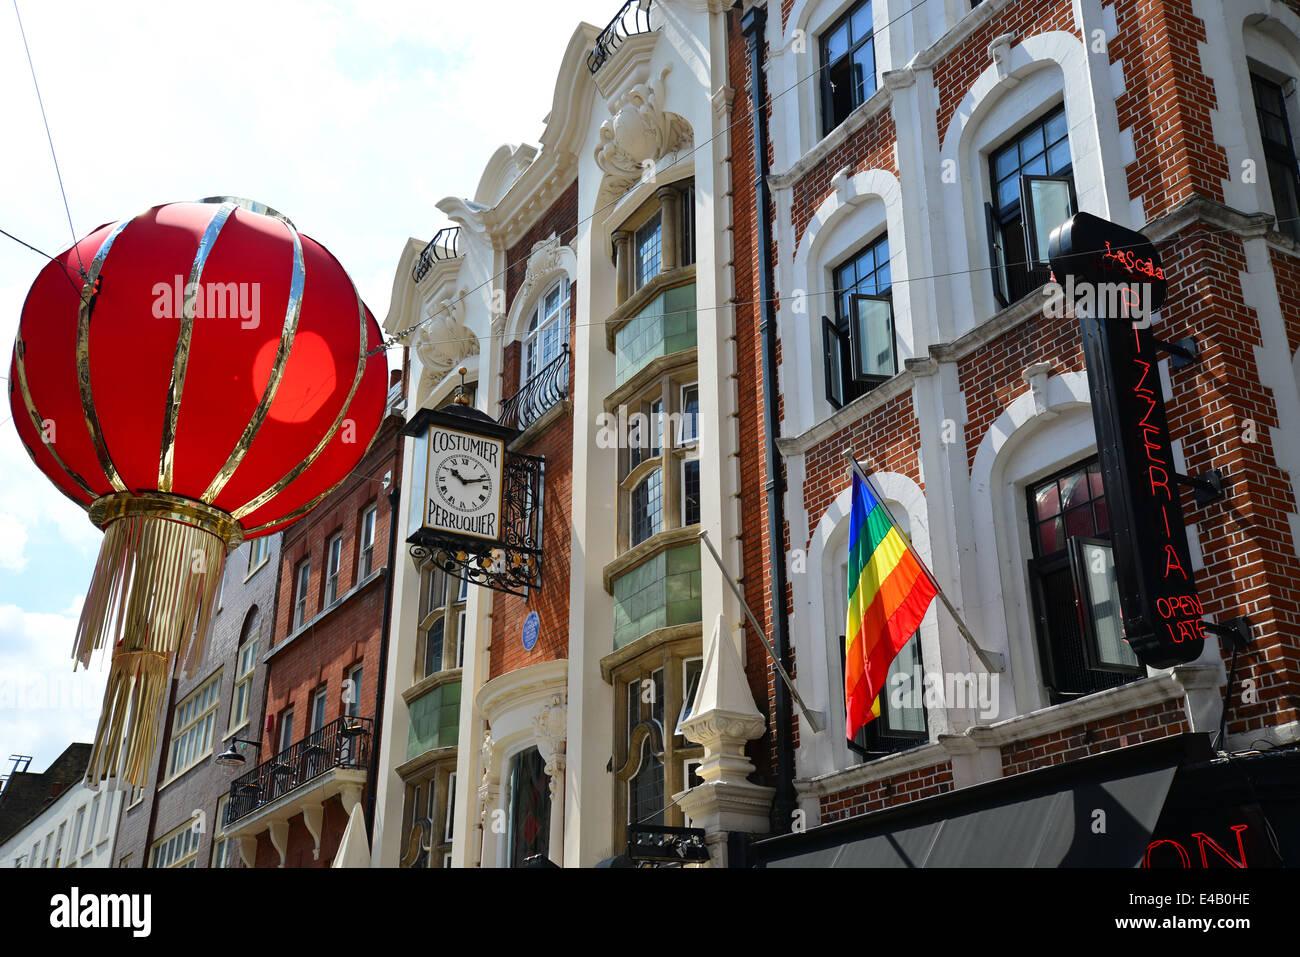 Chinese lantern decoration, Wardour Street, Chinatown, West End, City of Westminster, London, England, United Kingdom - Stock Image